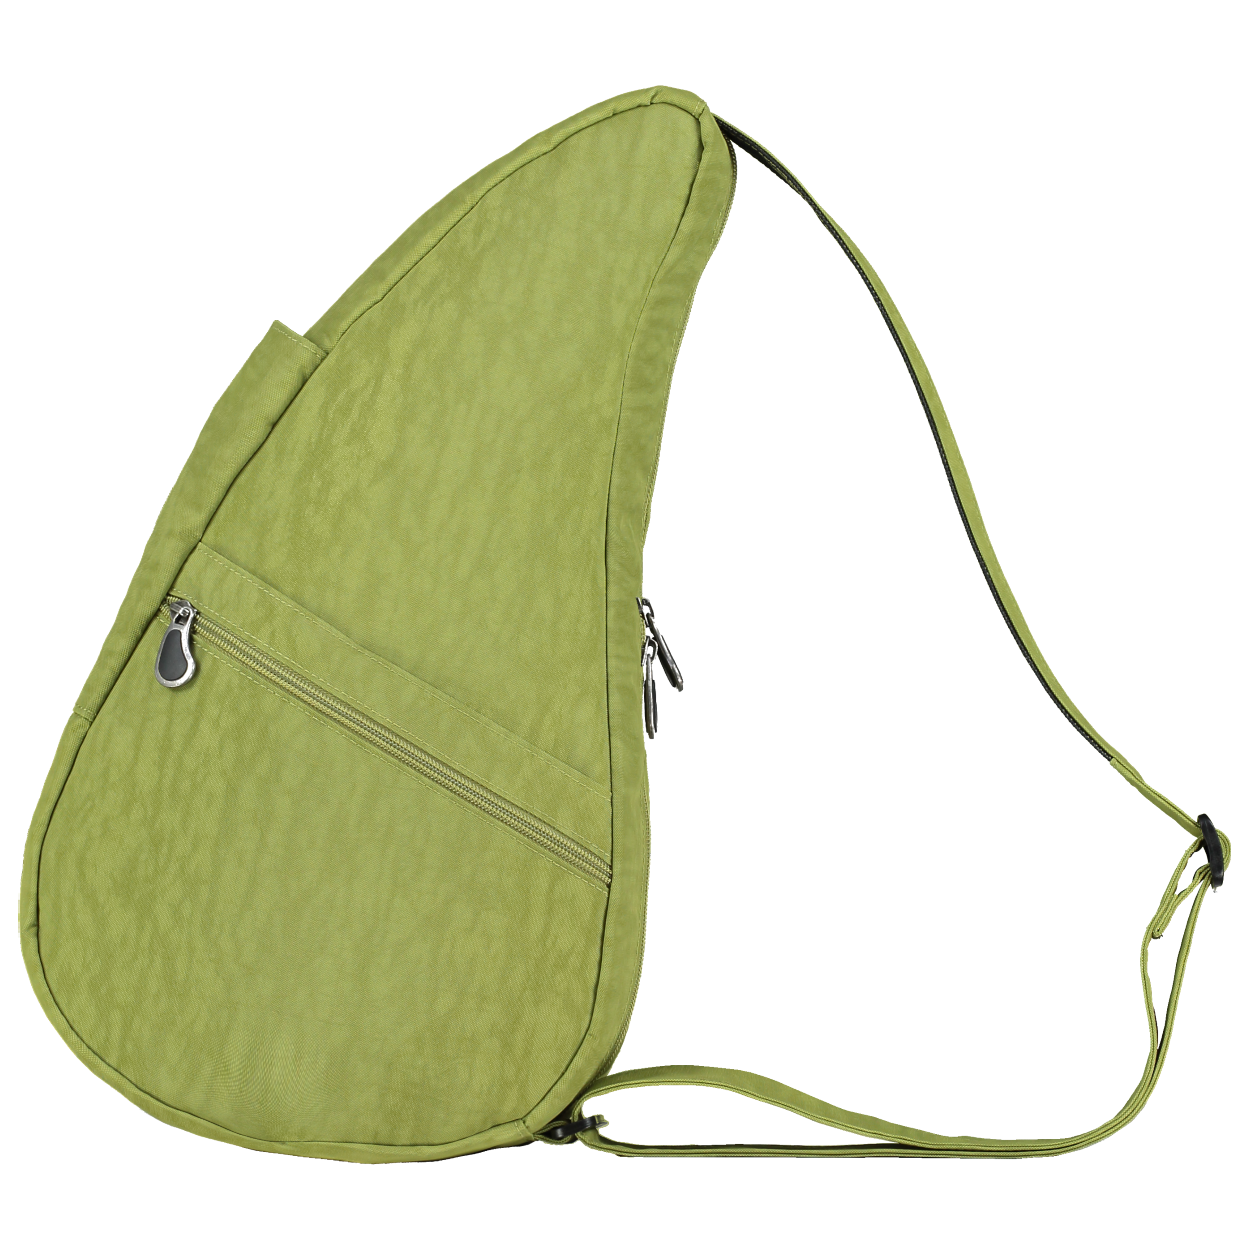 Healthy Back Bag 6303 Textured Nylon Avocado S